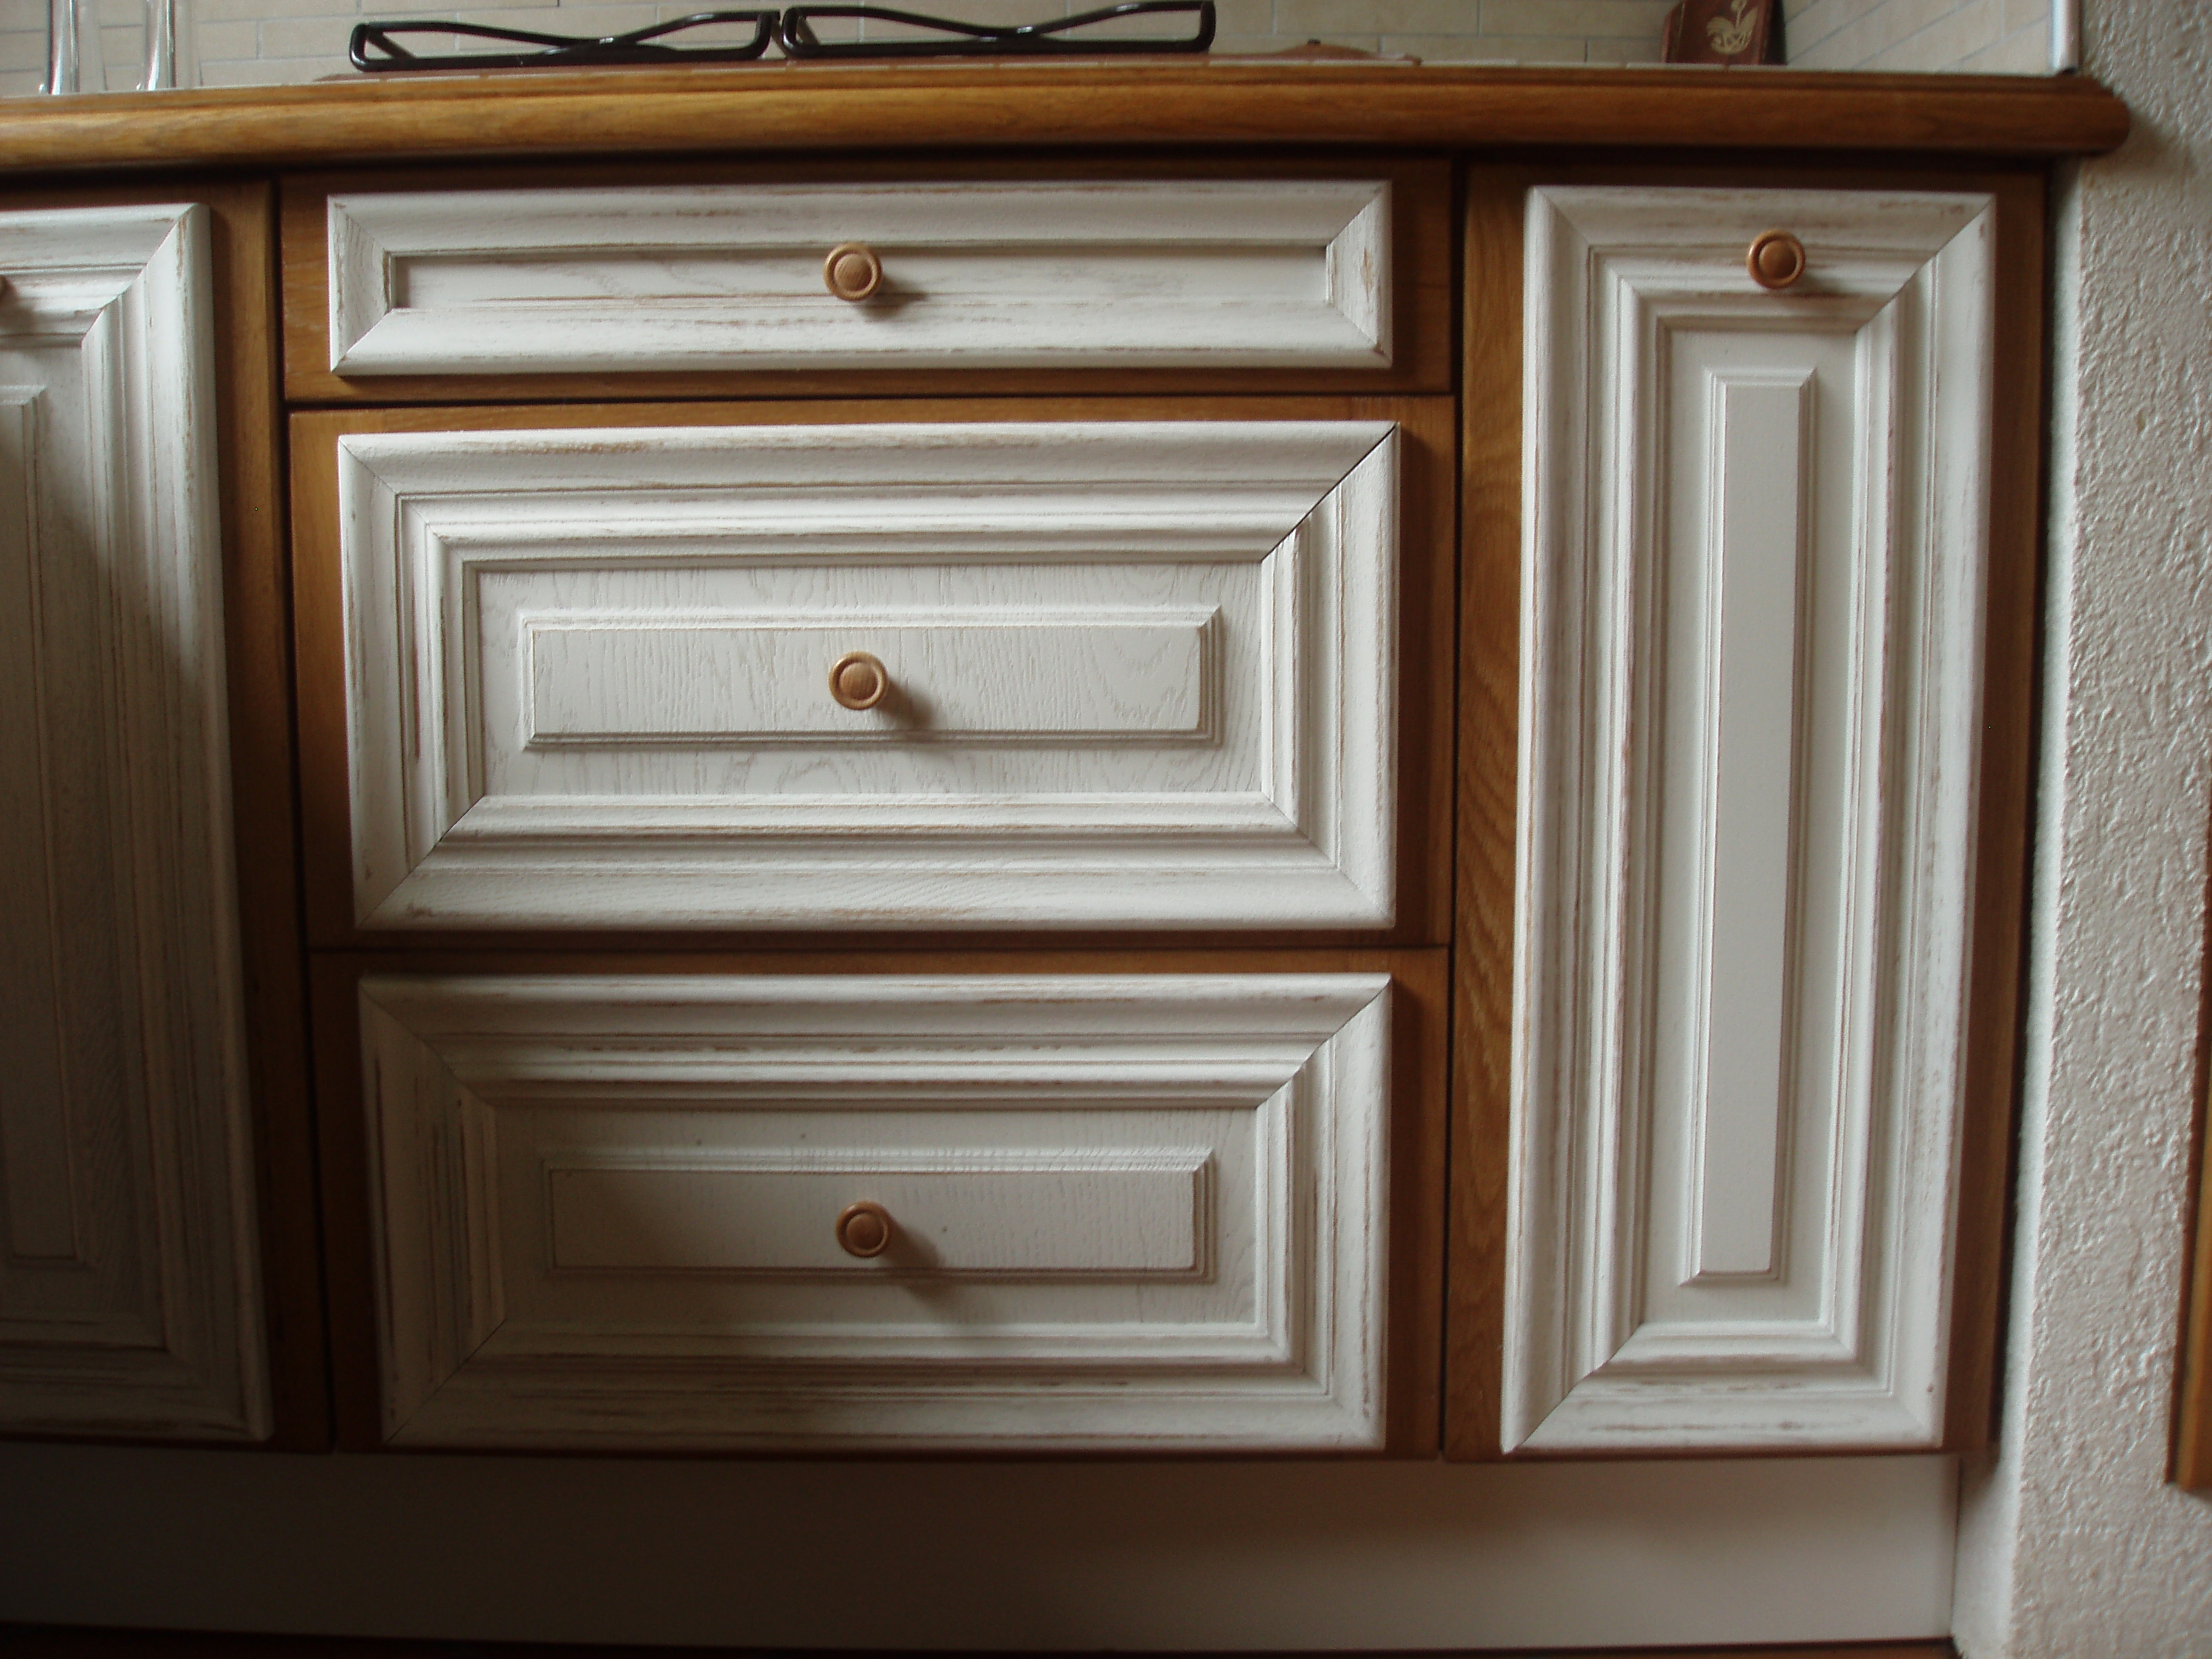 zoom casserolier/ tiroir blanc vieilli cadre chêne clair